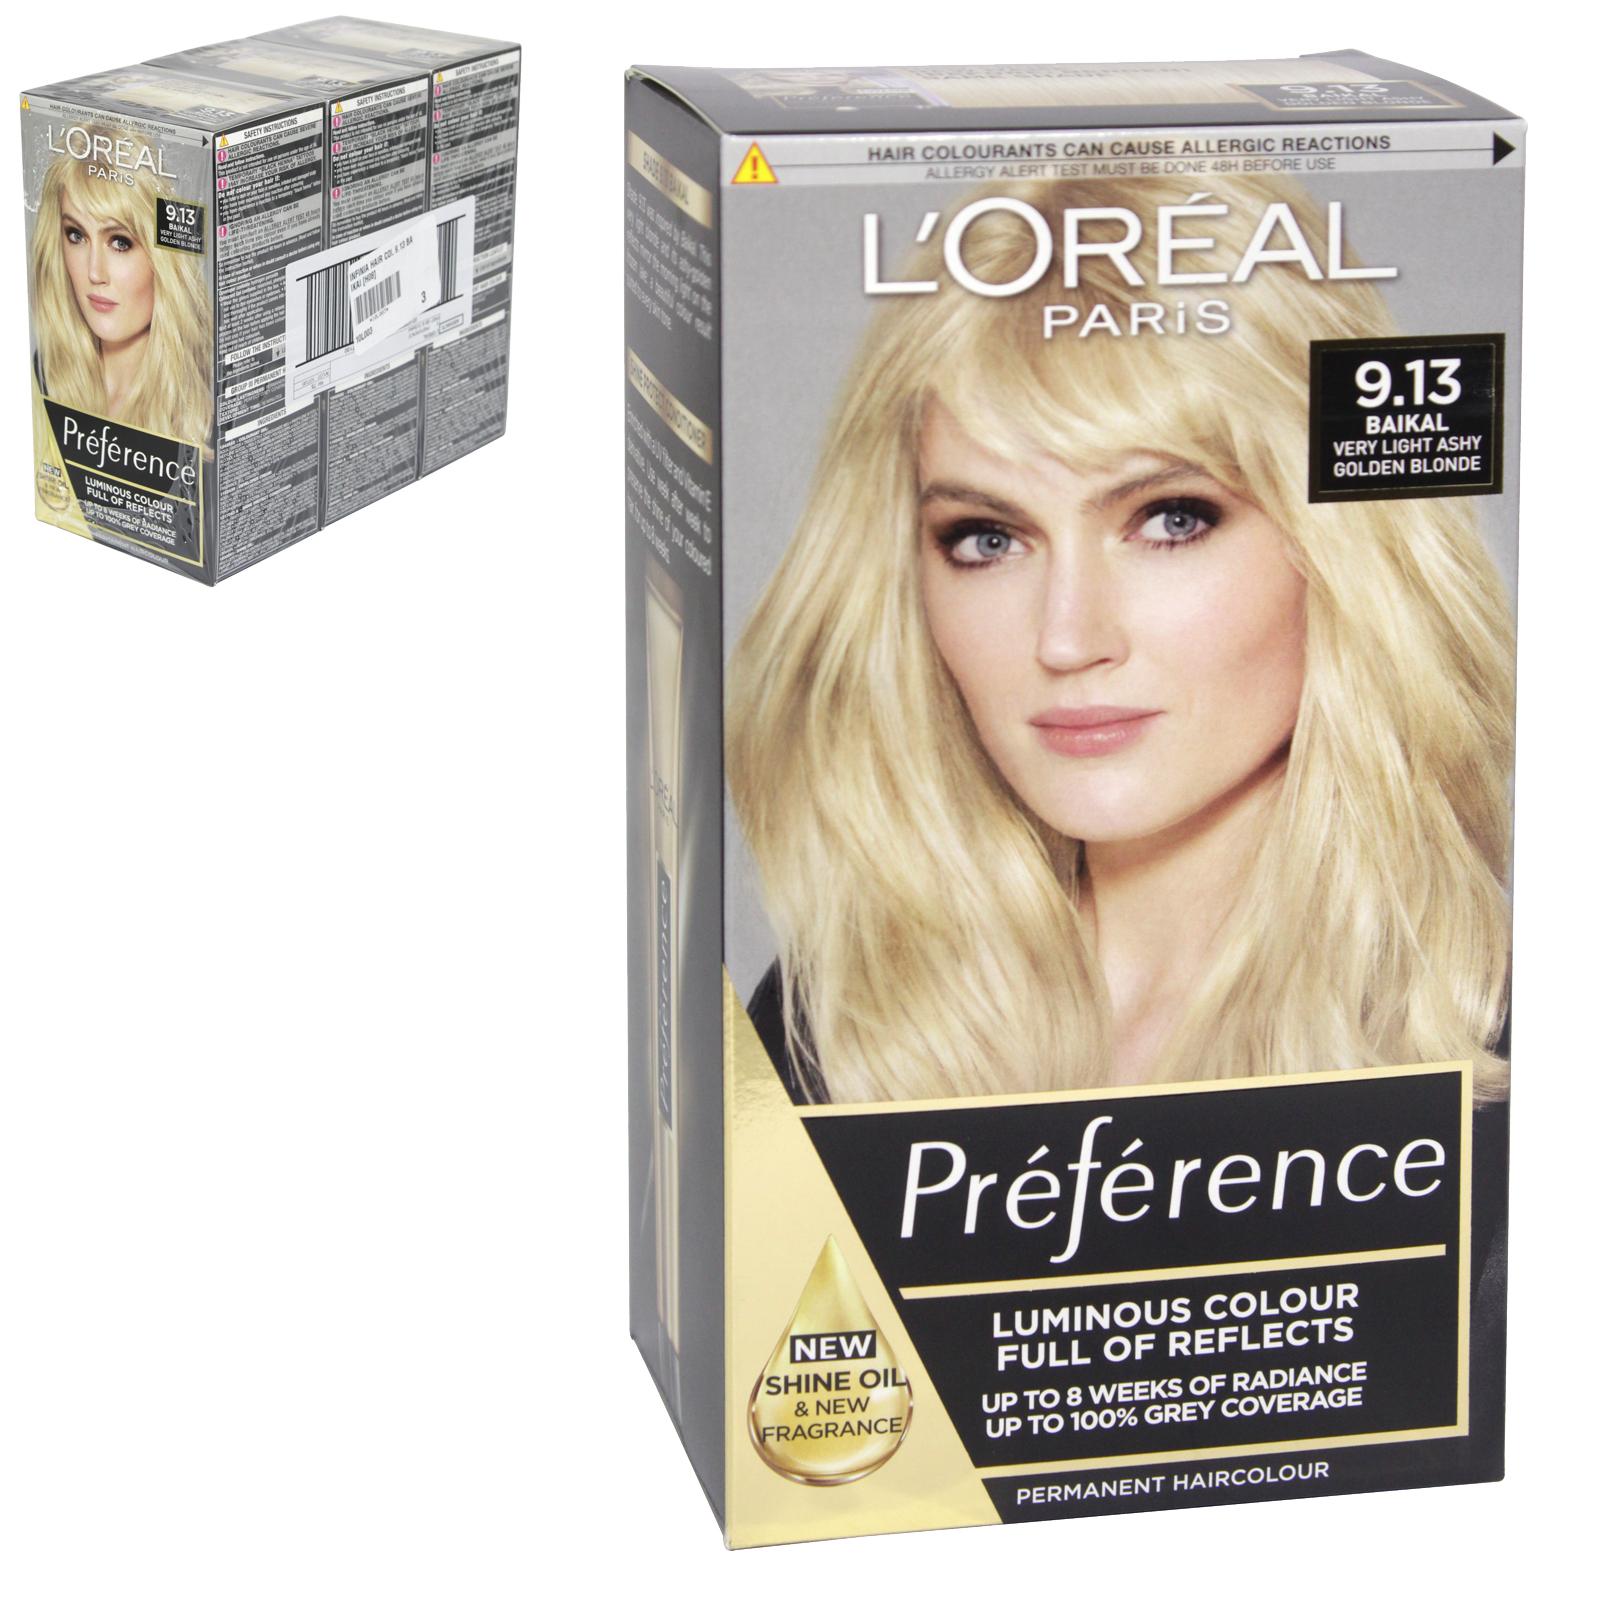 INFINIA PREFRENCE HAIR COLOUR 9.13 BERGEN X3